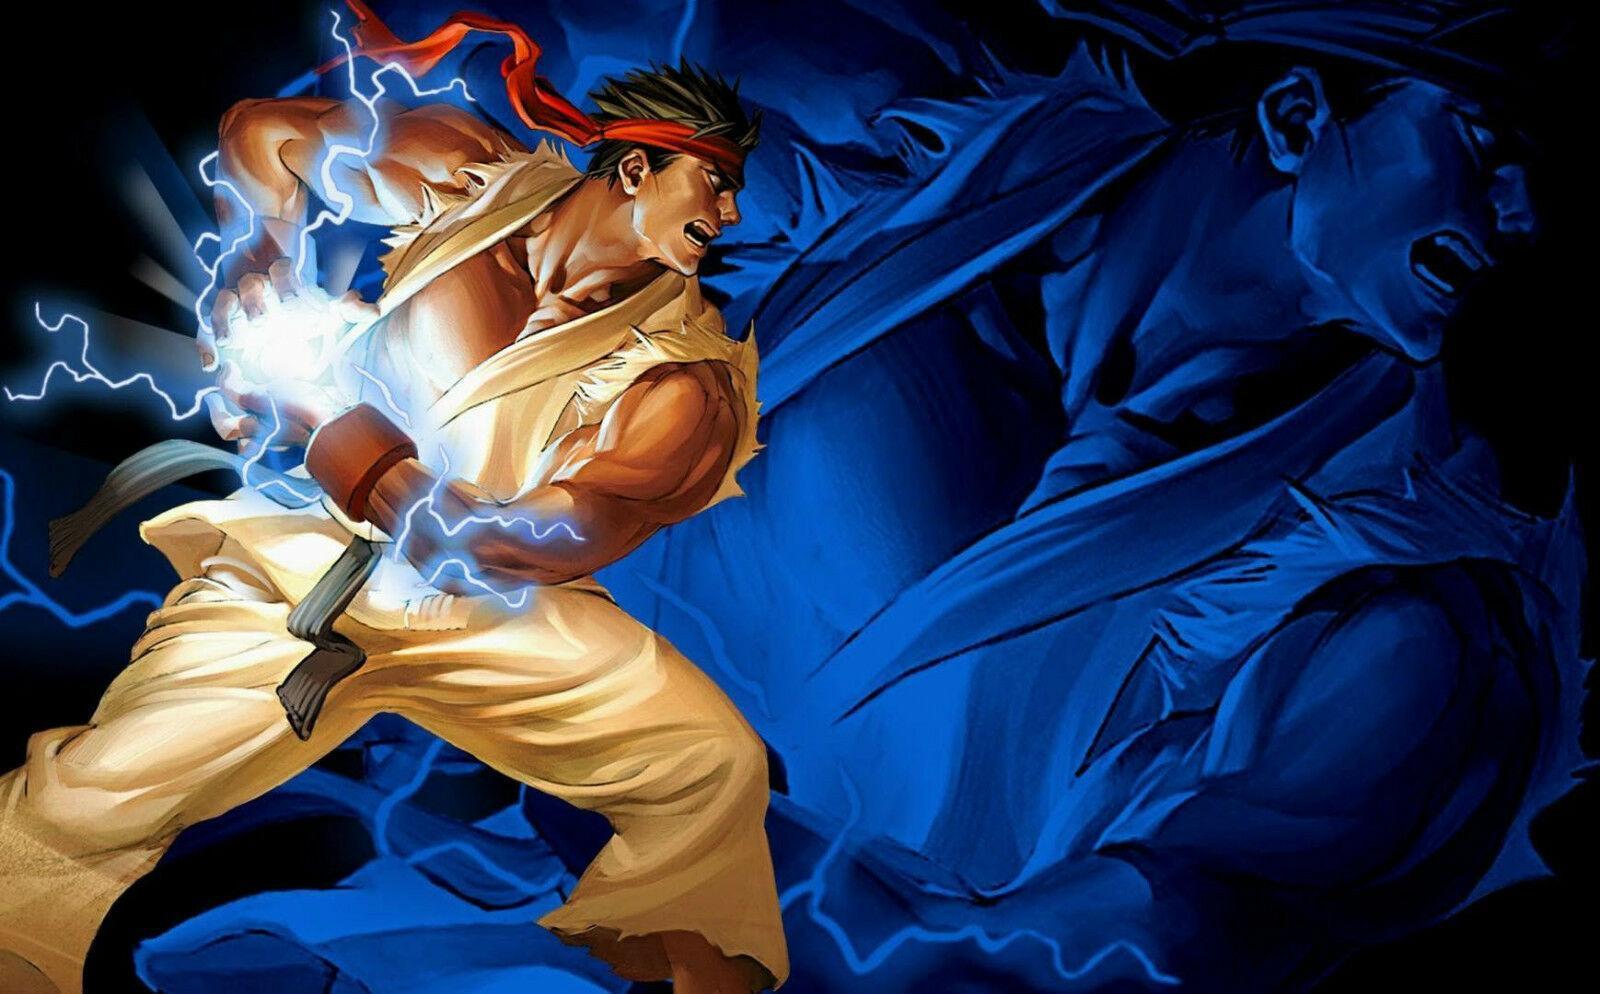 2020 Ryu The Street Fighter Wall Decor Art Silk Print Poster